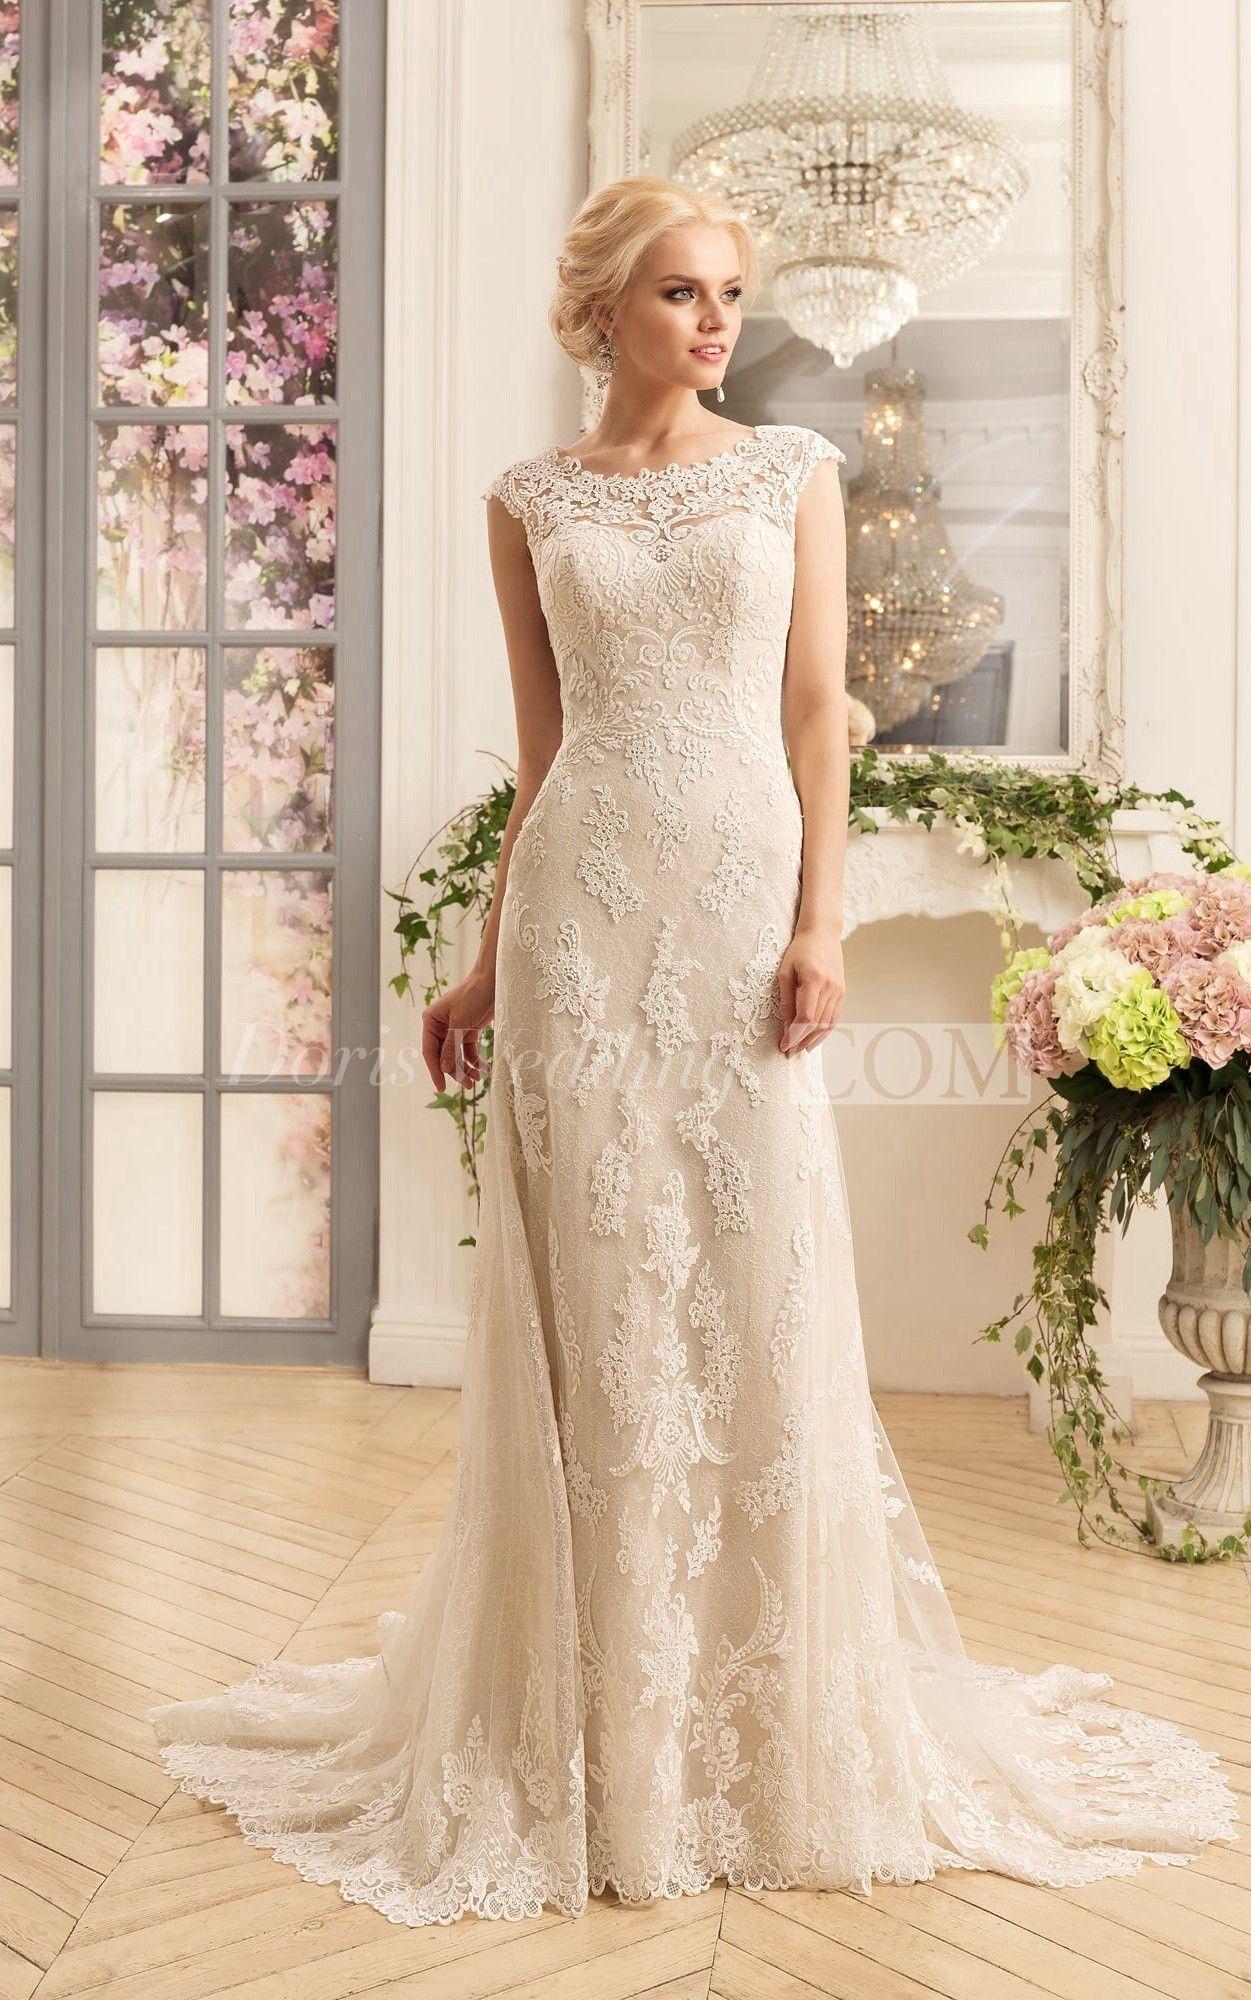 Illusion lace wedding dress  USuIllusion Back Sheath Lace Wedding Dress riswedding